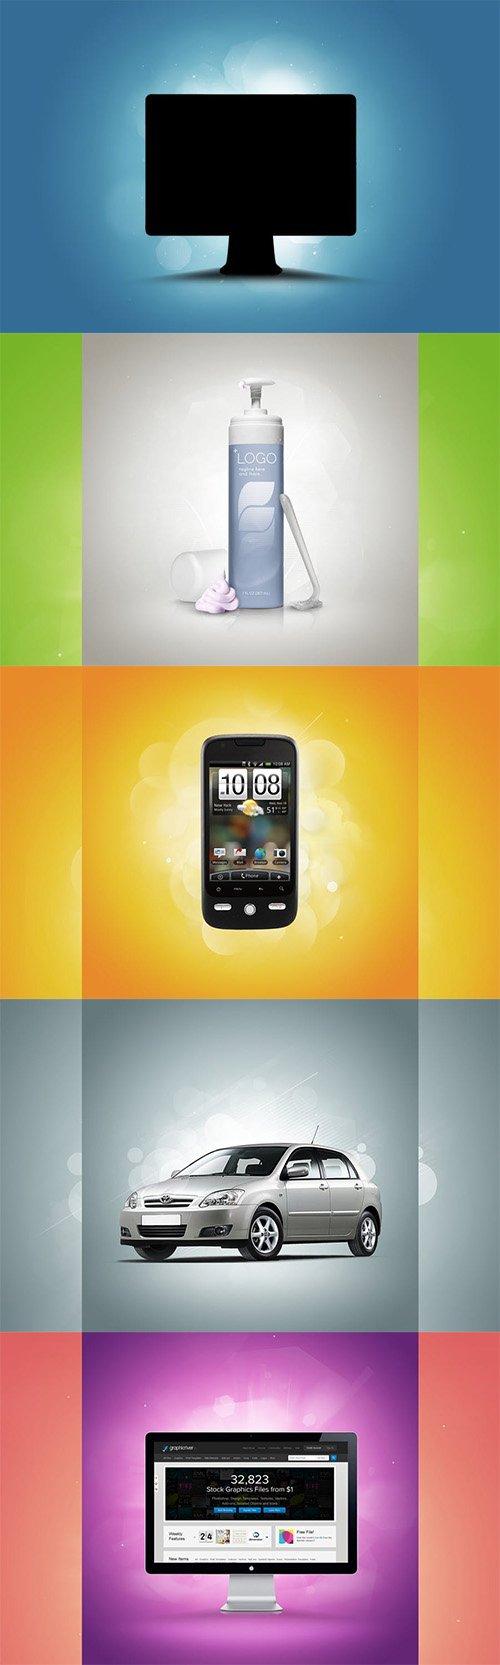 Colourful Bokeh Background Creator